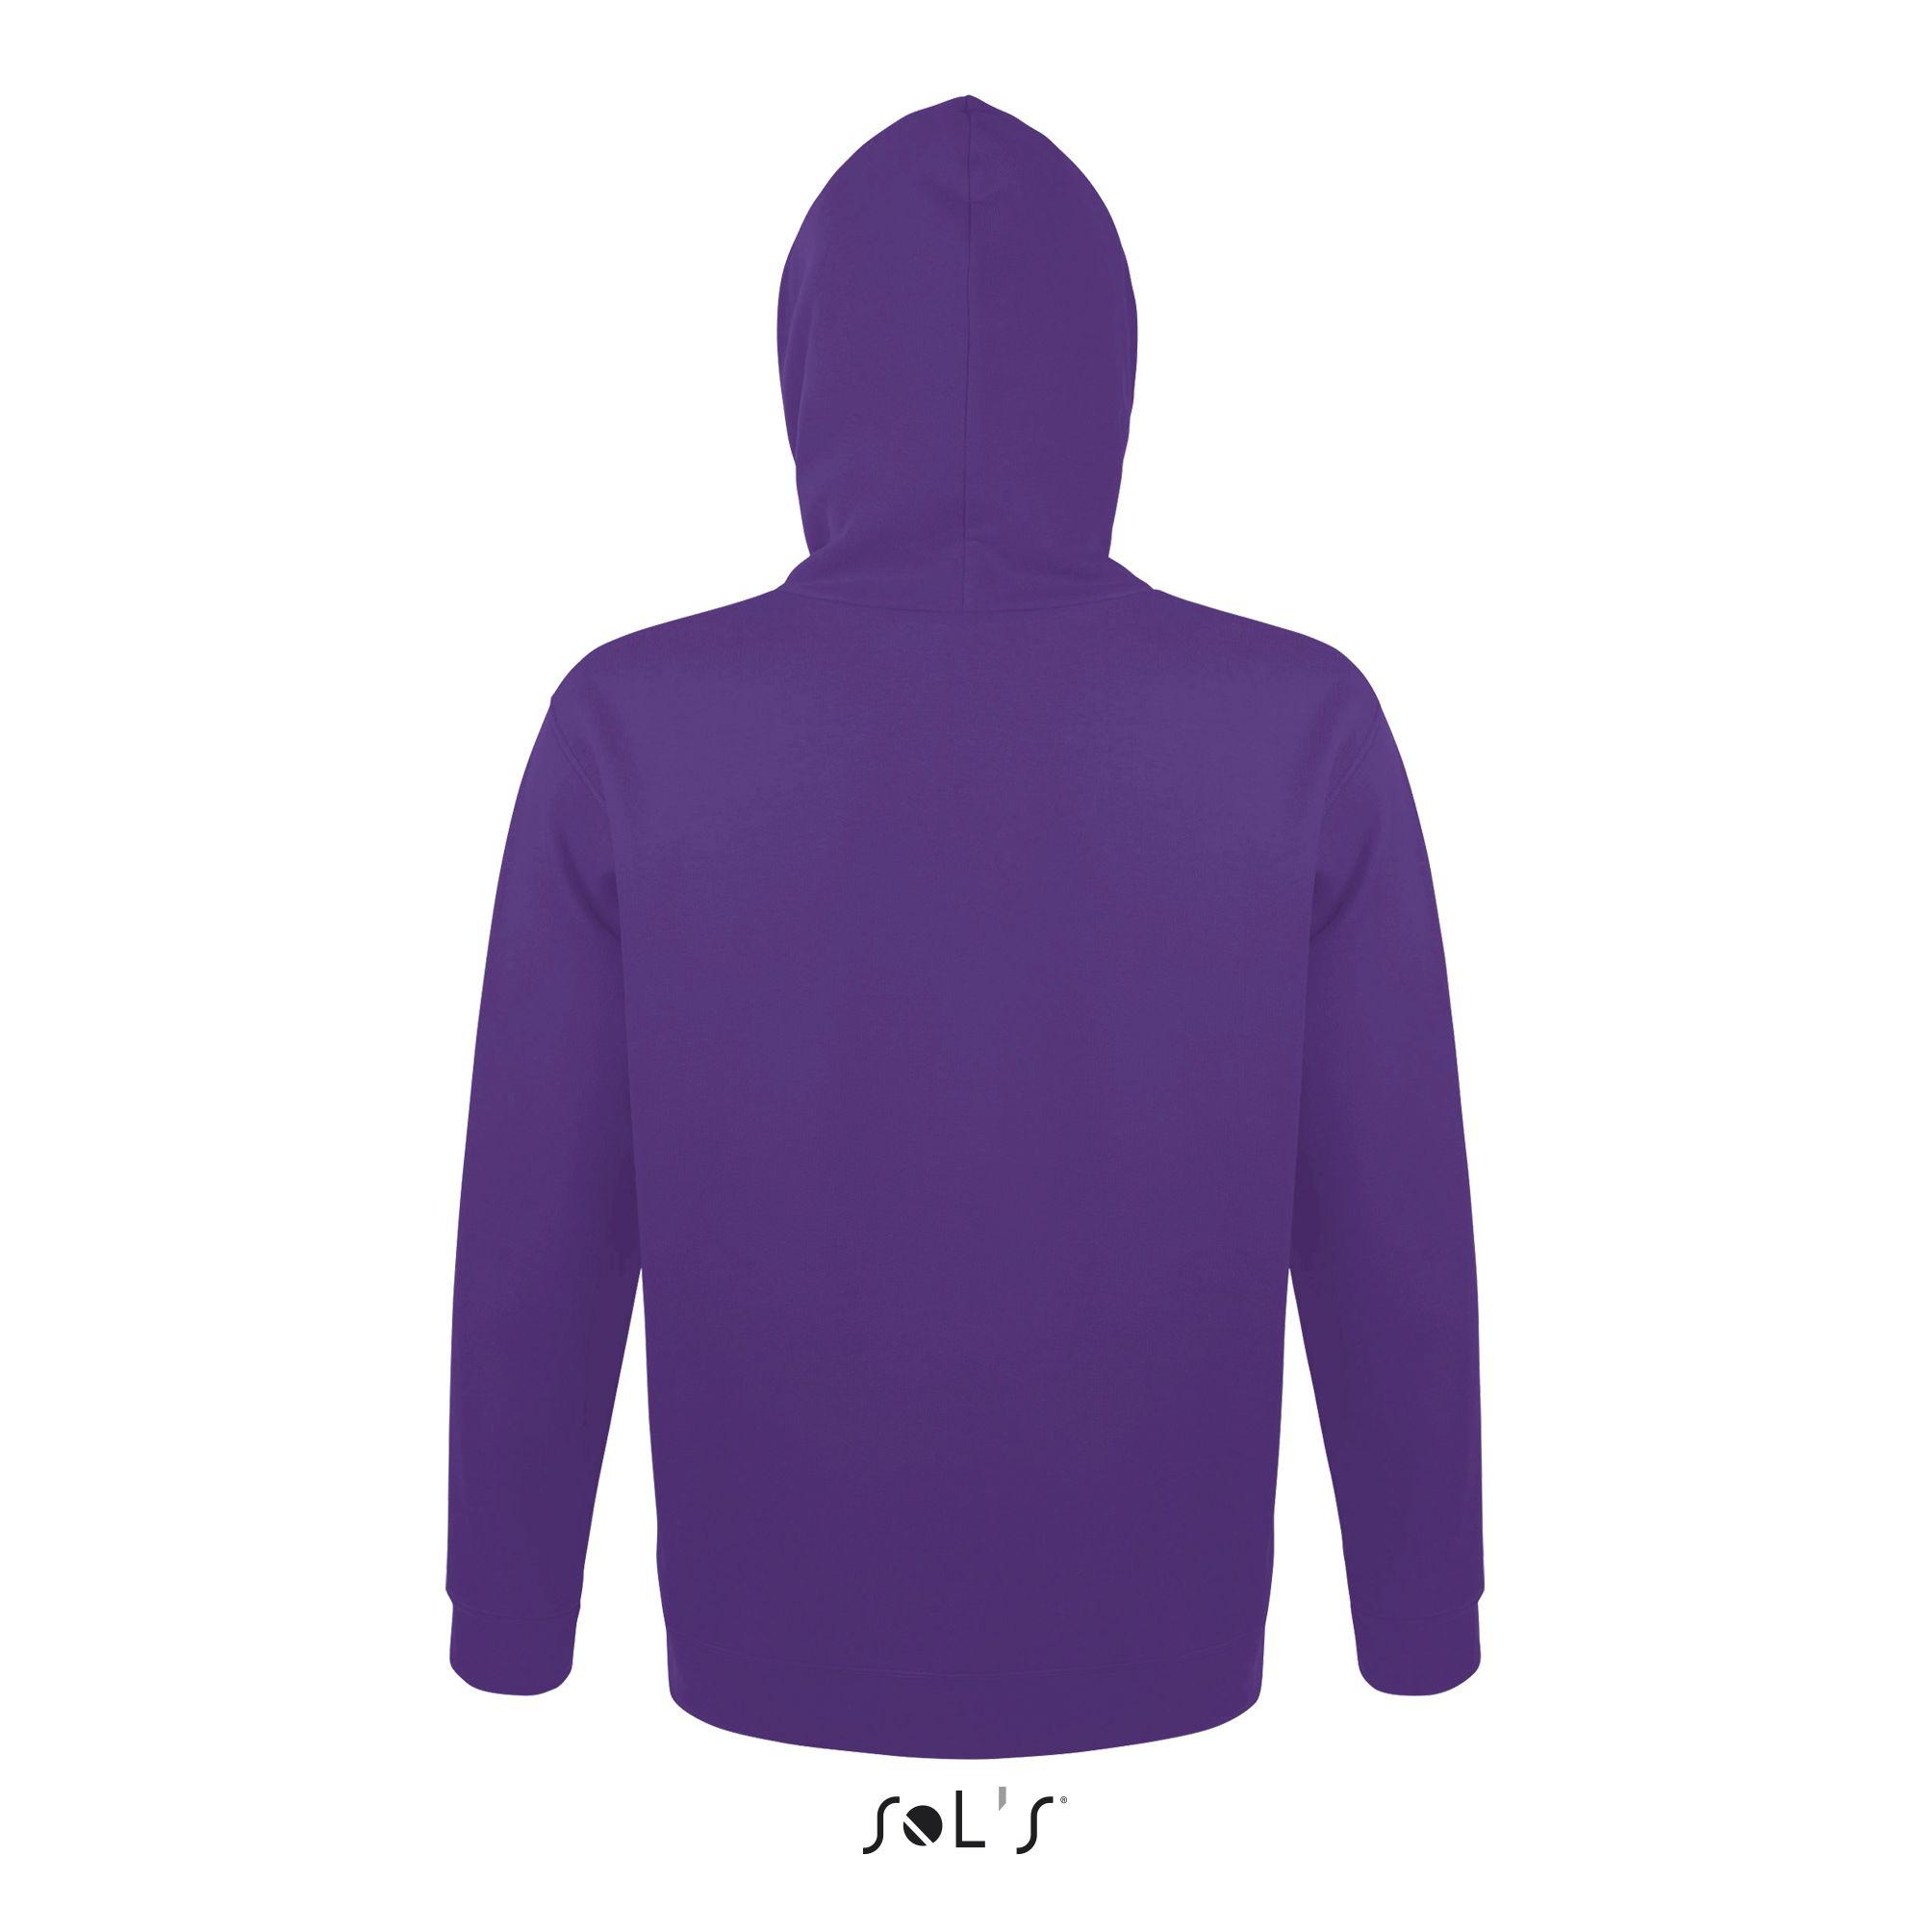 712 - Dark purple